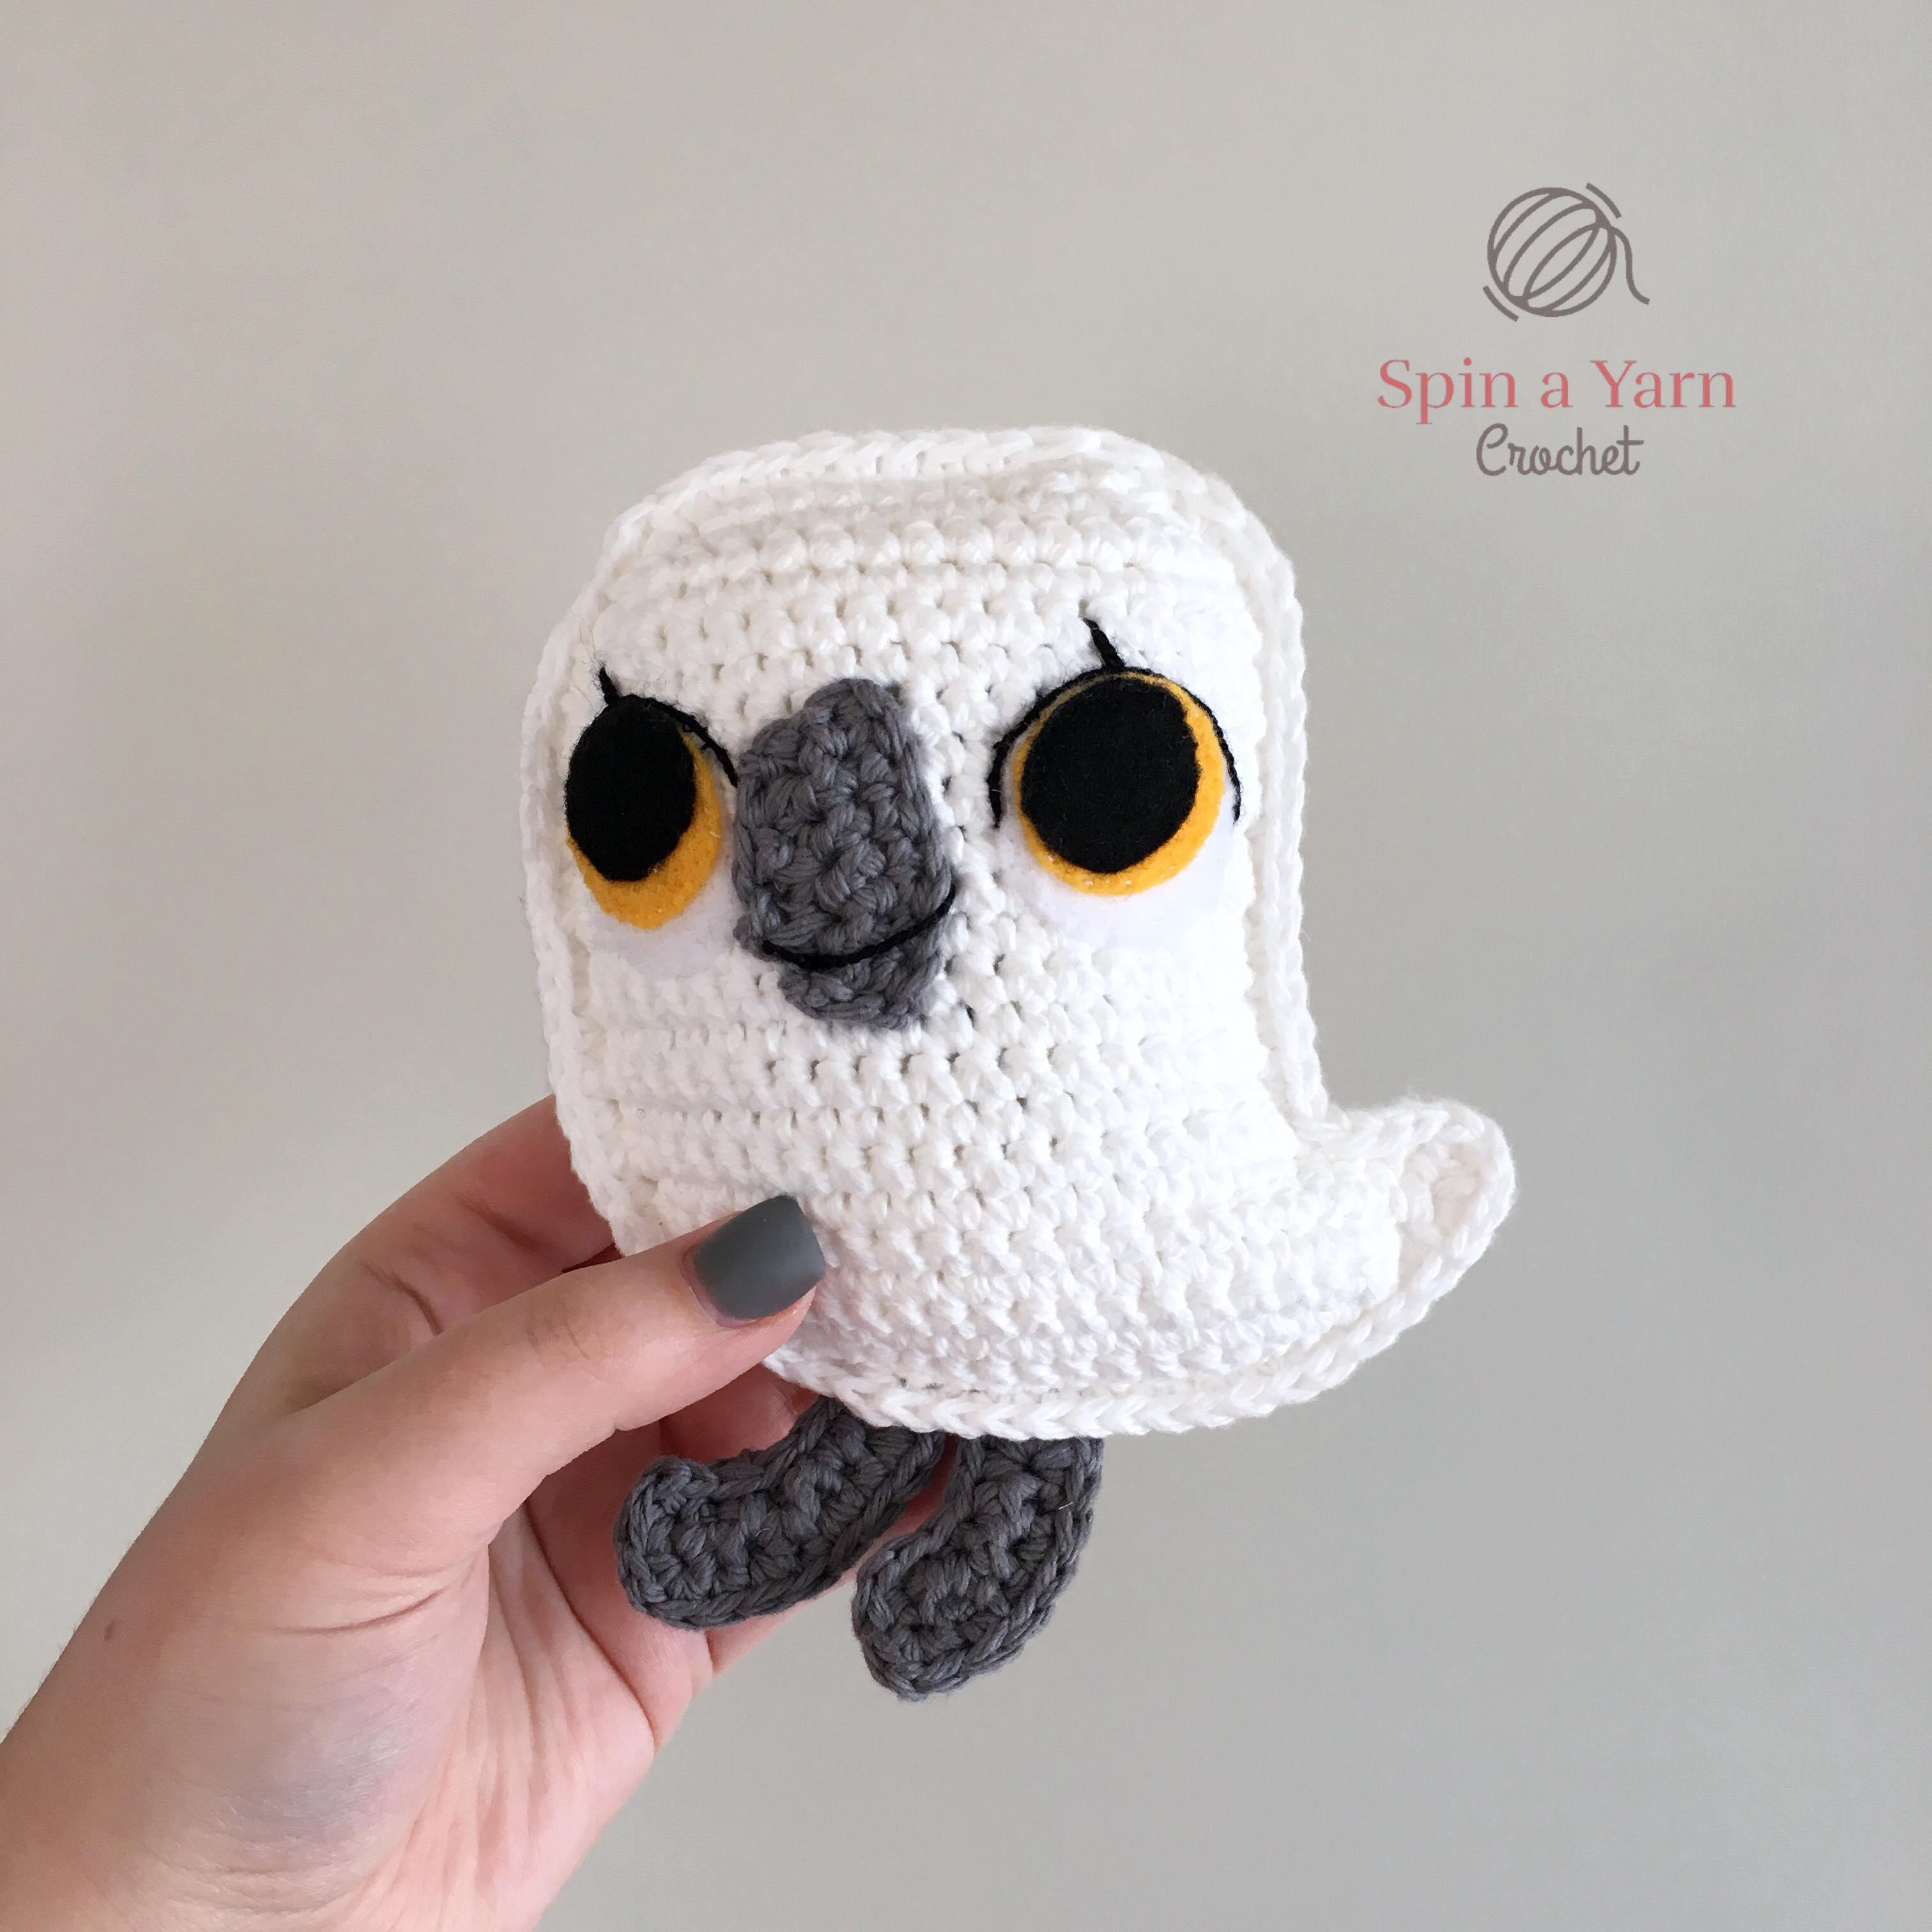 Baba the Baby Puffin Free Crochet Pattern • Spin a Yarn Crochet